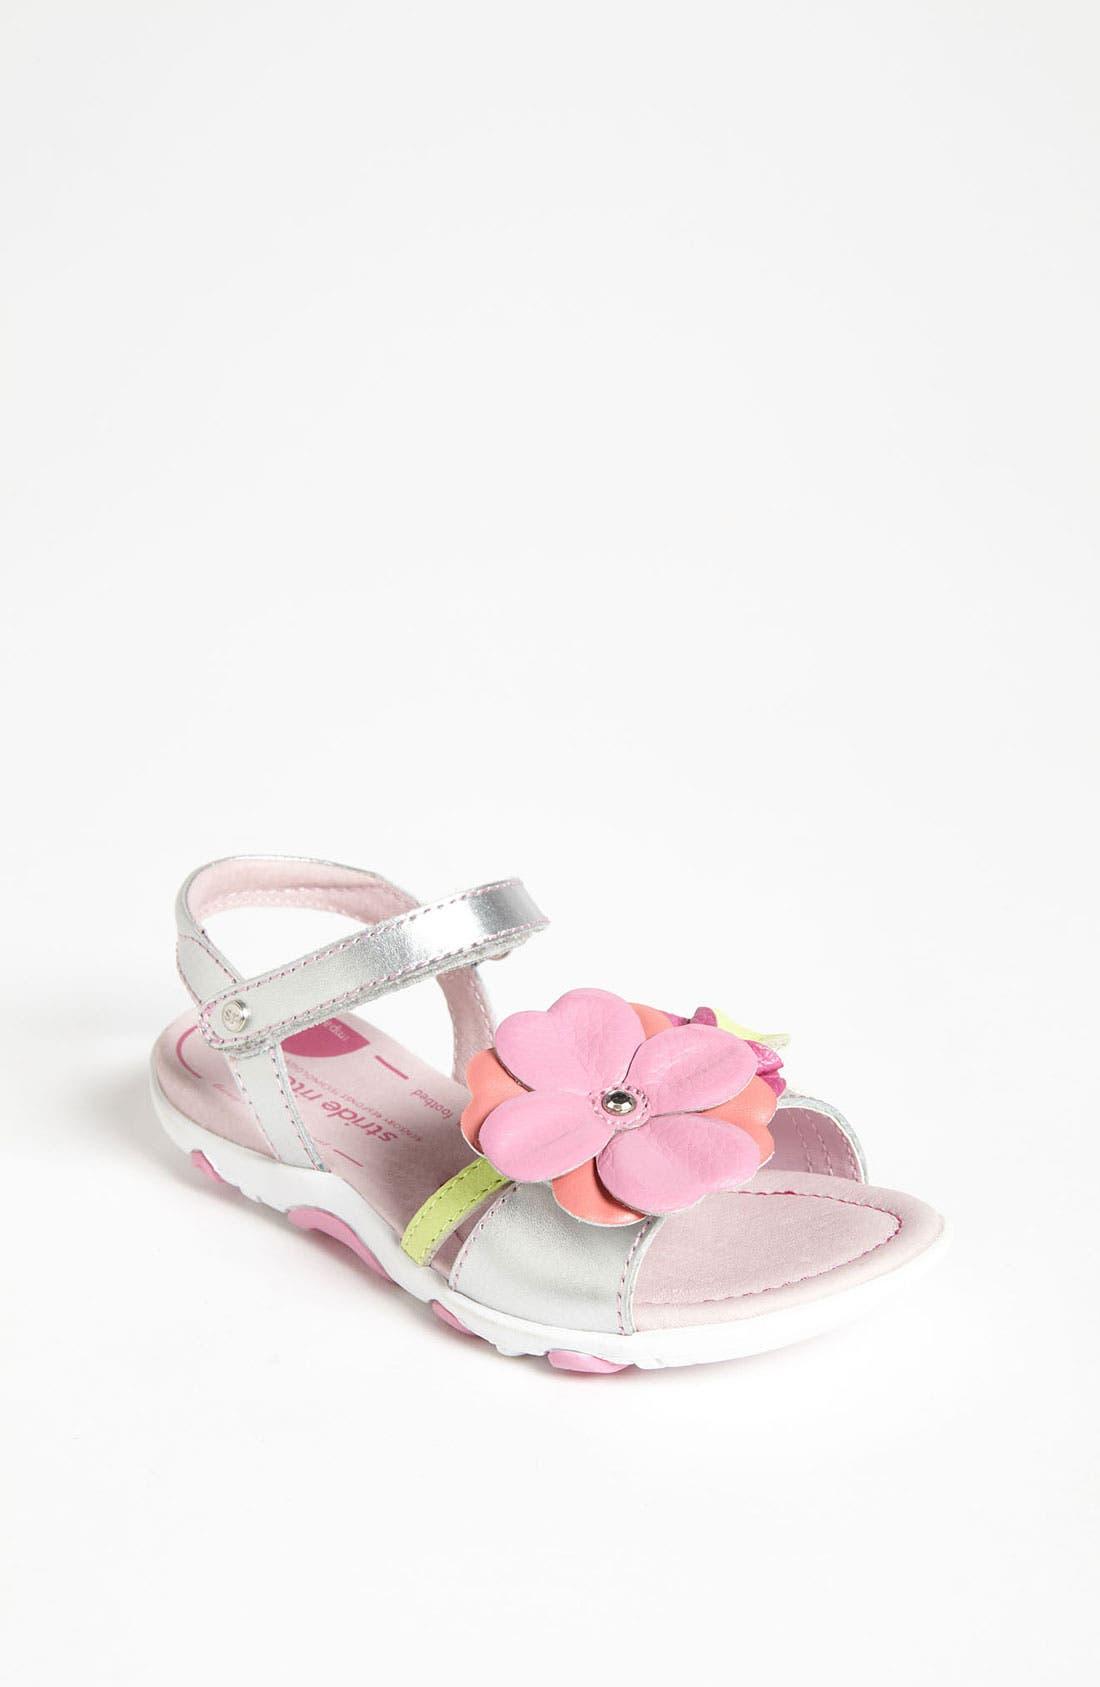 Alternate Image 1 Selected - Stride Rite 'Dixon' Sandal (Toddler)